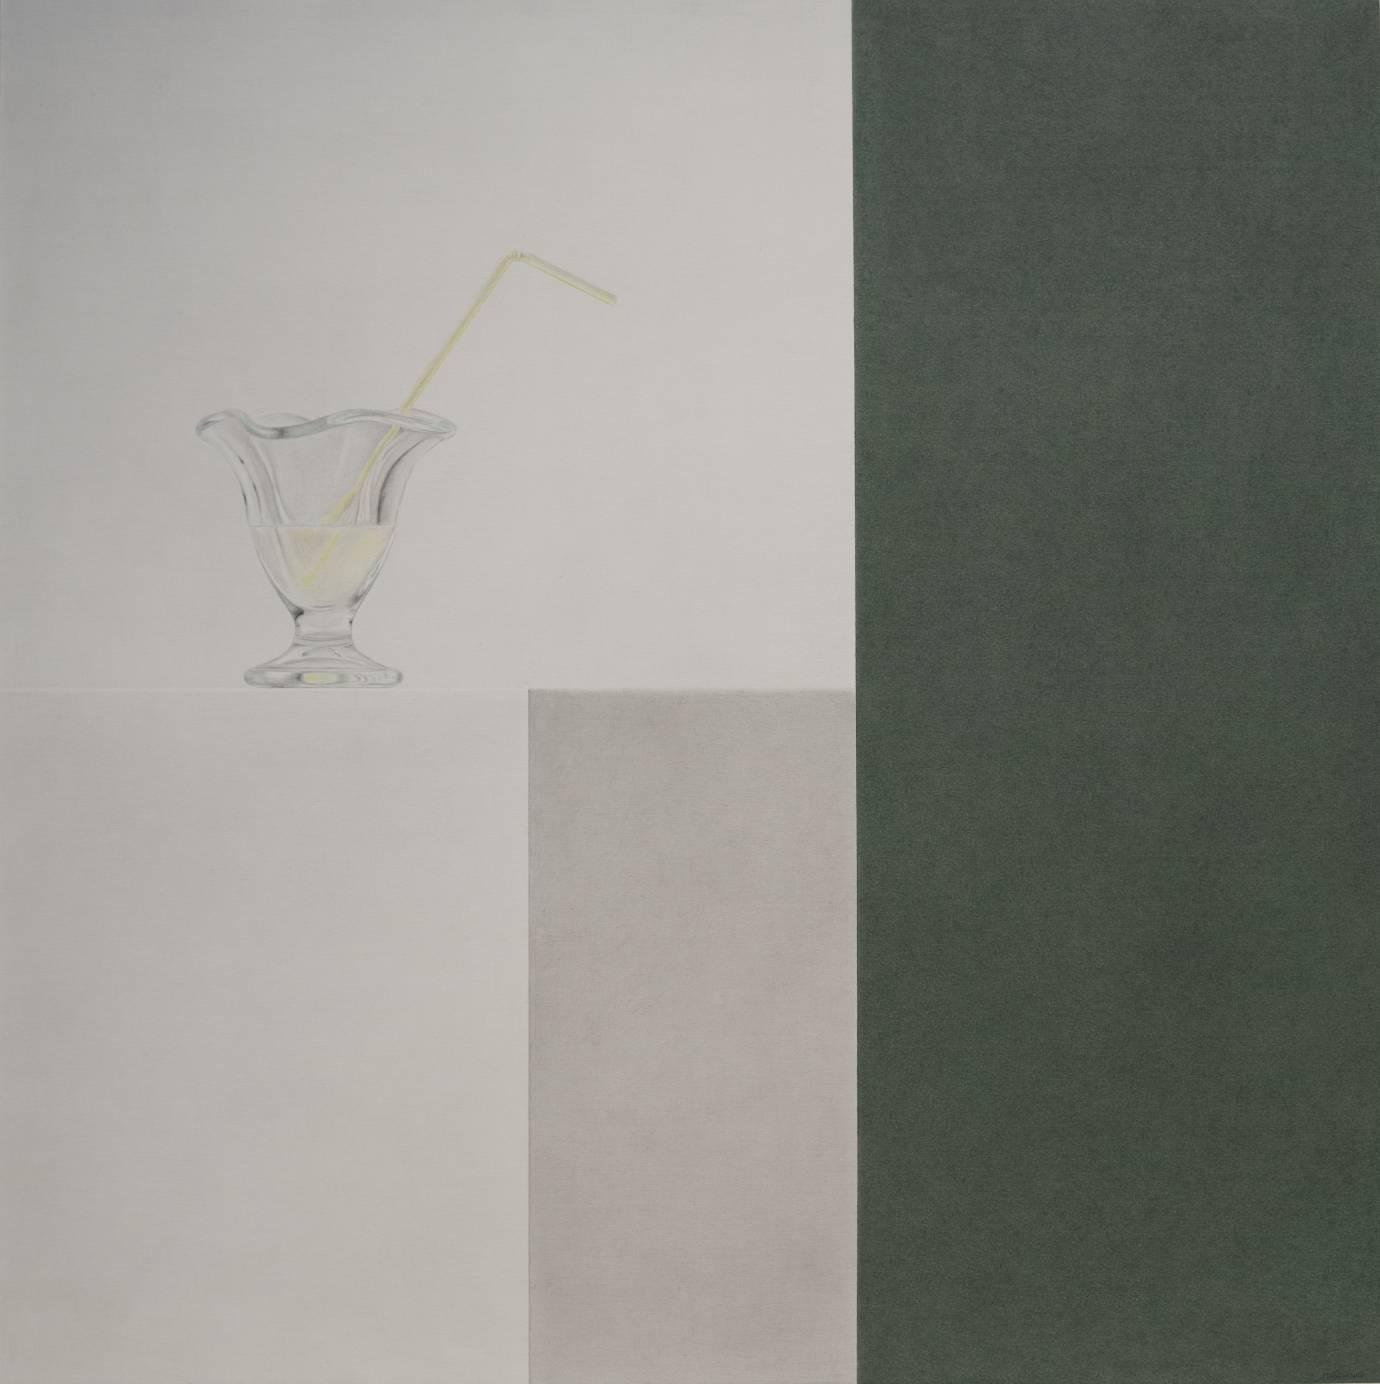 Agua de limón (2020) - Angel Luis Muñoz Durán